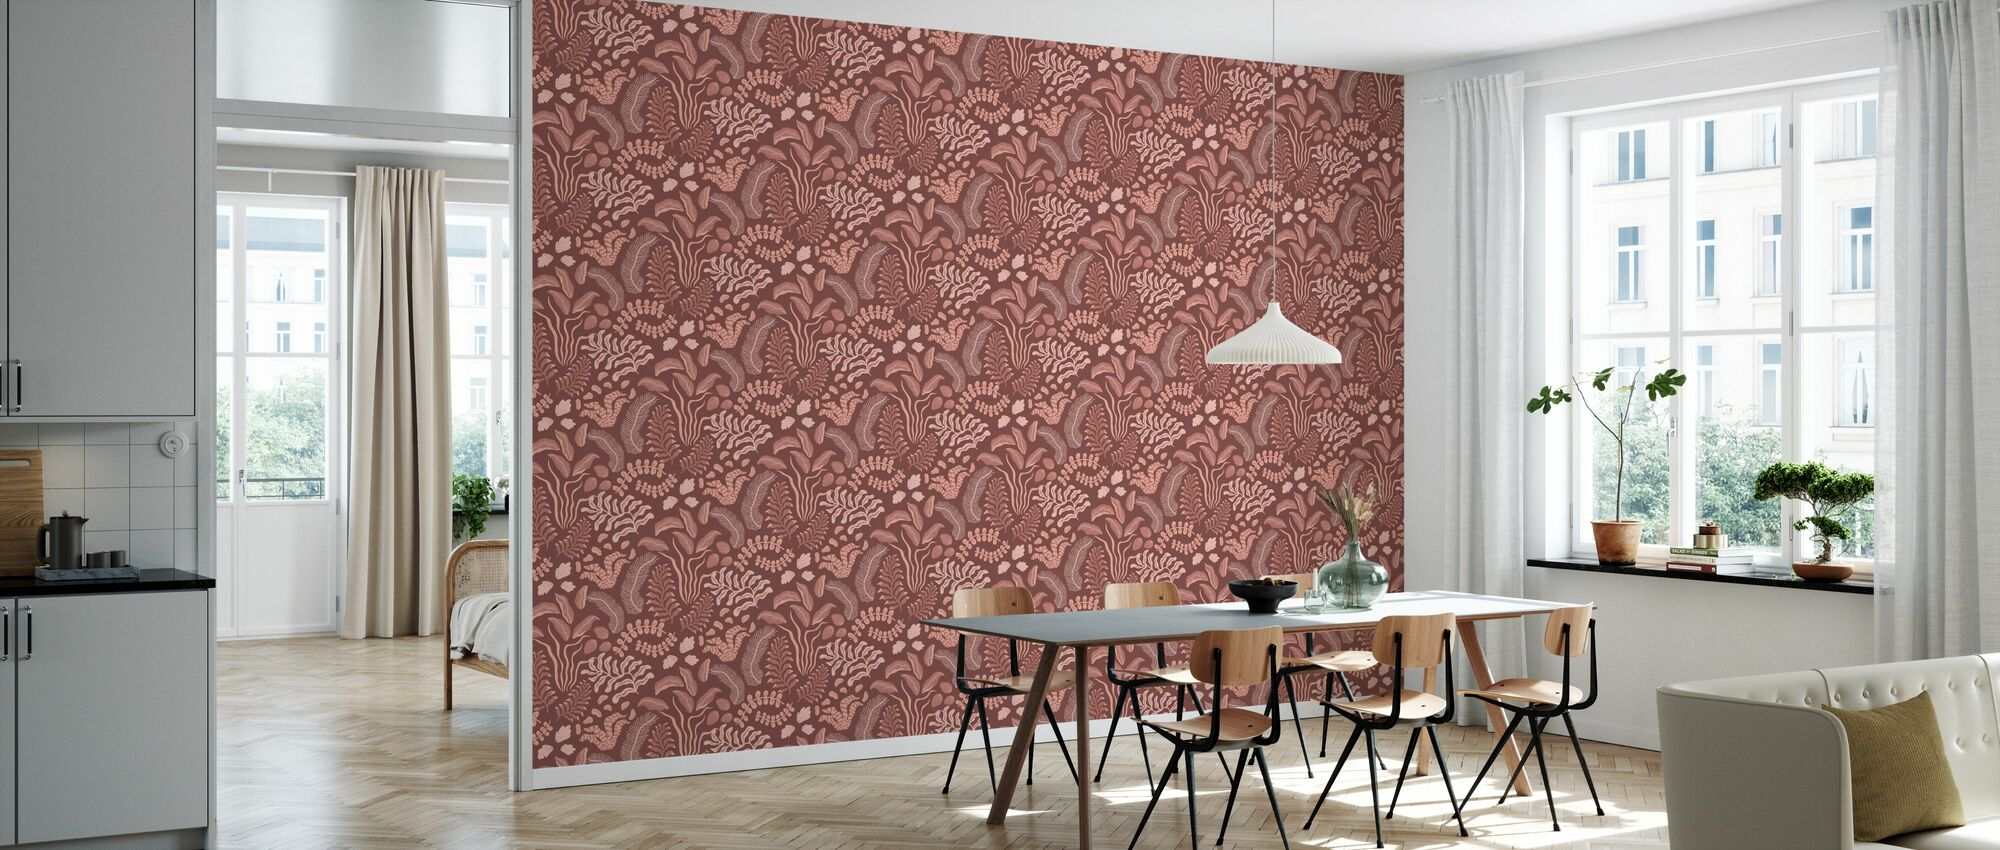 Sonja Pink - Wallpaper - Kitchen